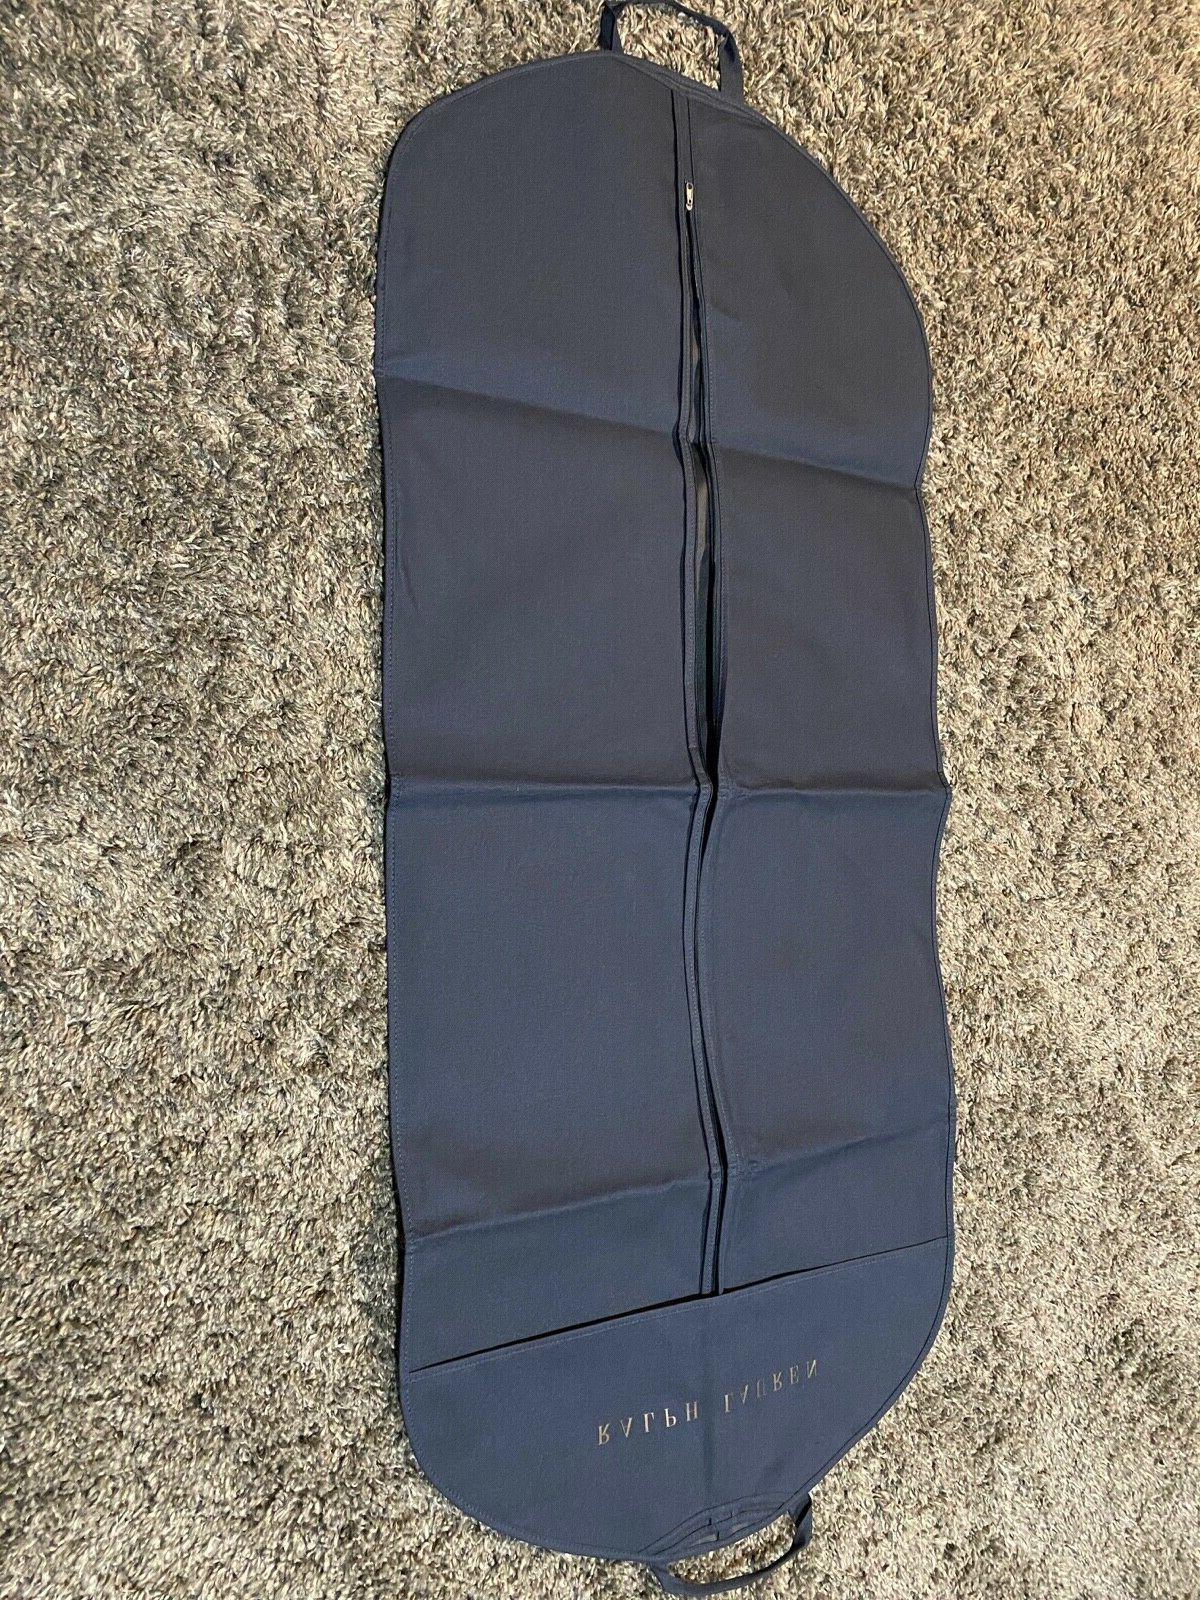 Polo Ralph gold suit large garment bag carry